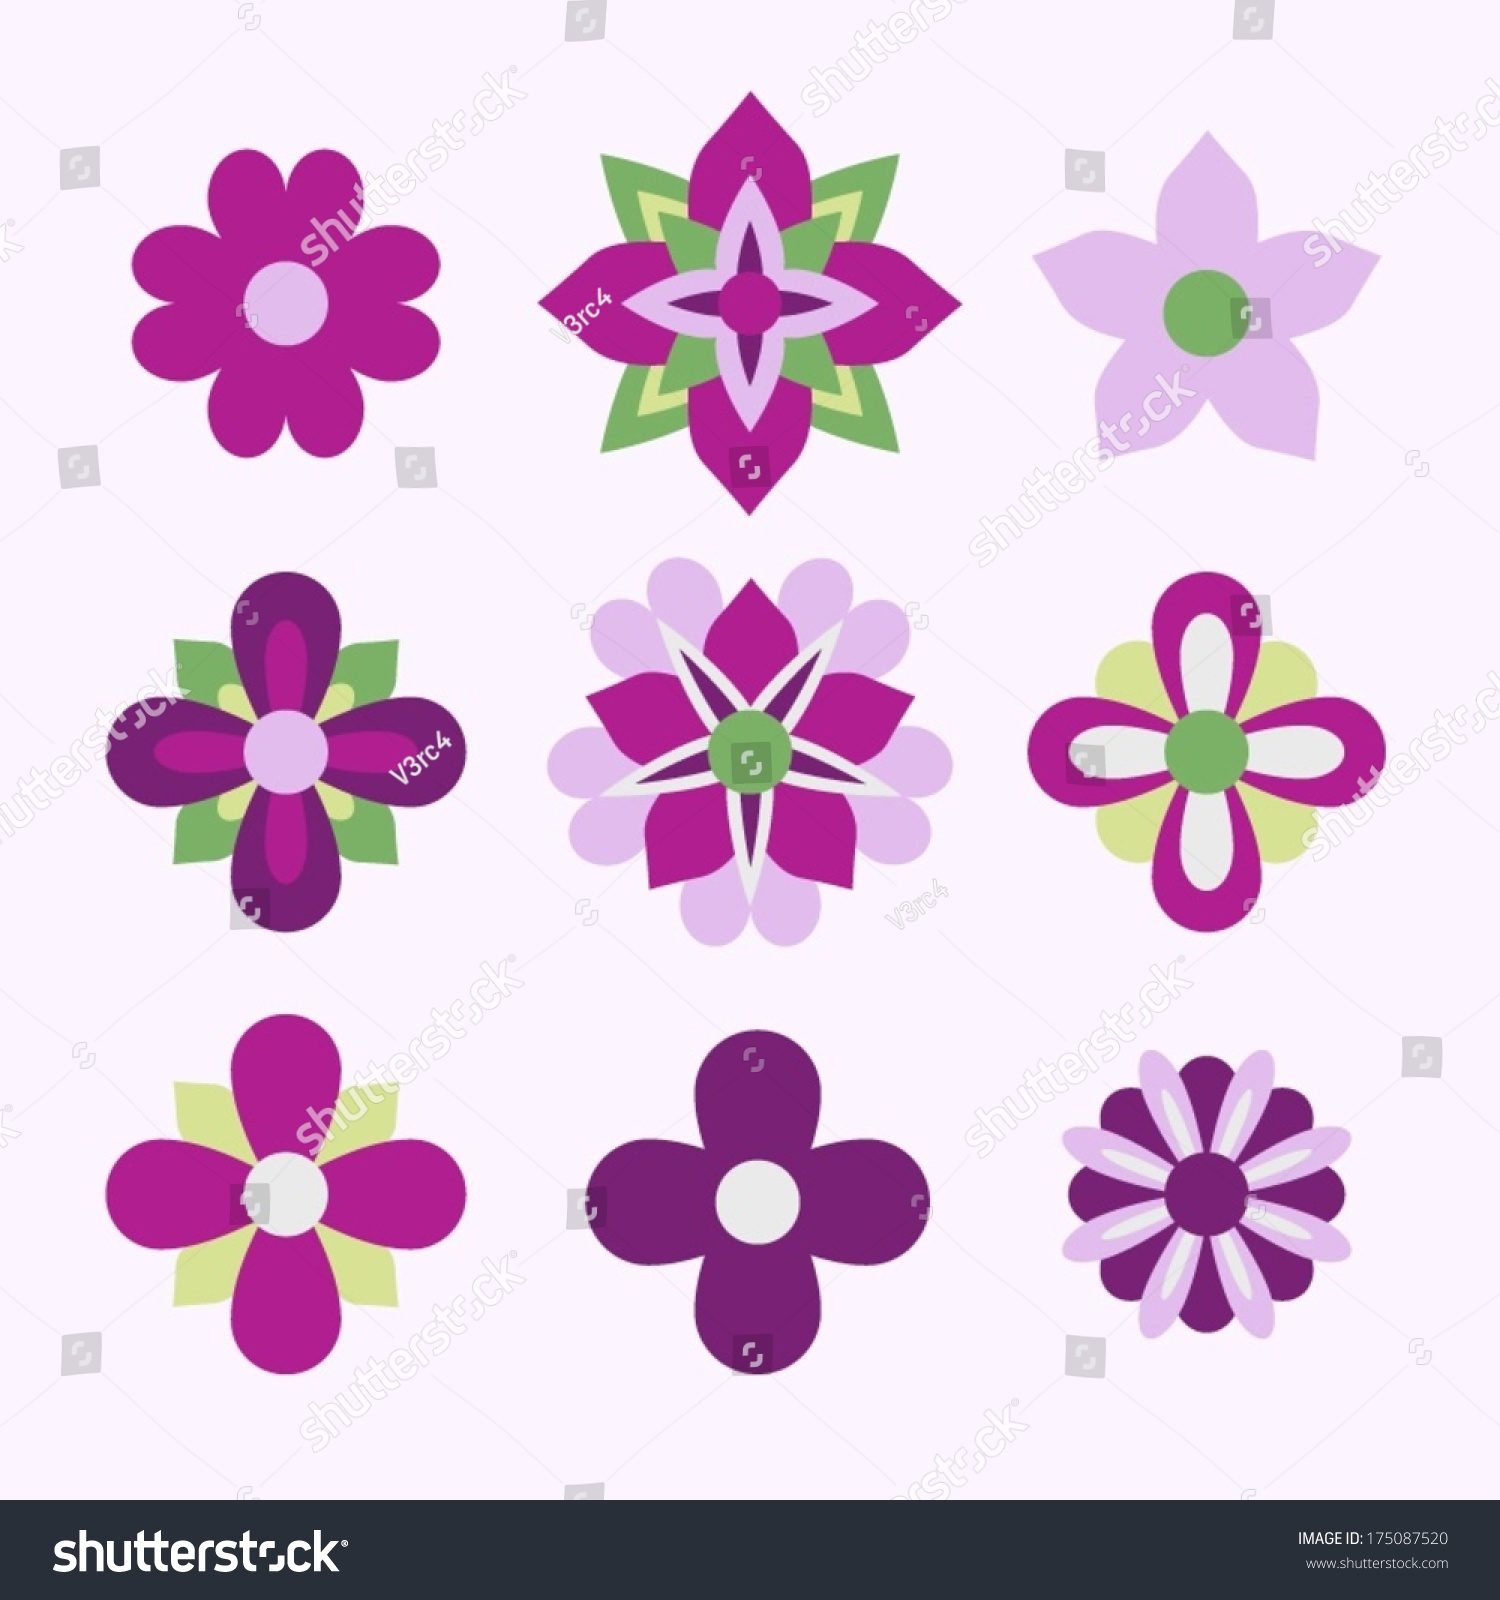 Pink flower icon set stock vector 175087520 shutterstock pink flower icon set mightylinksfo Choice Image